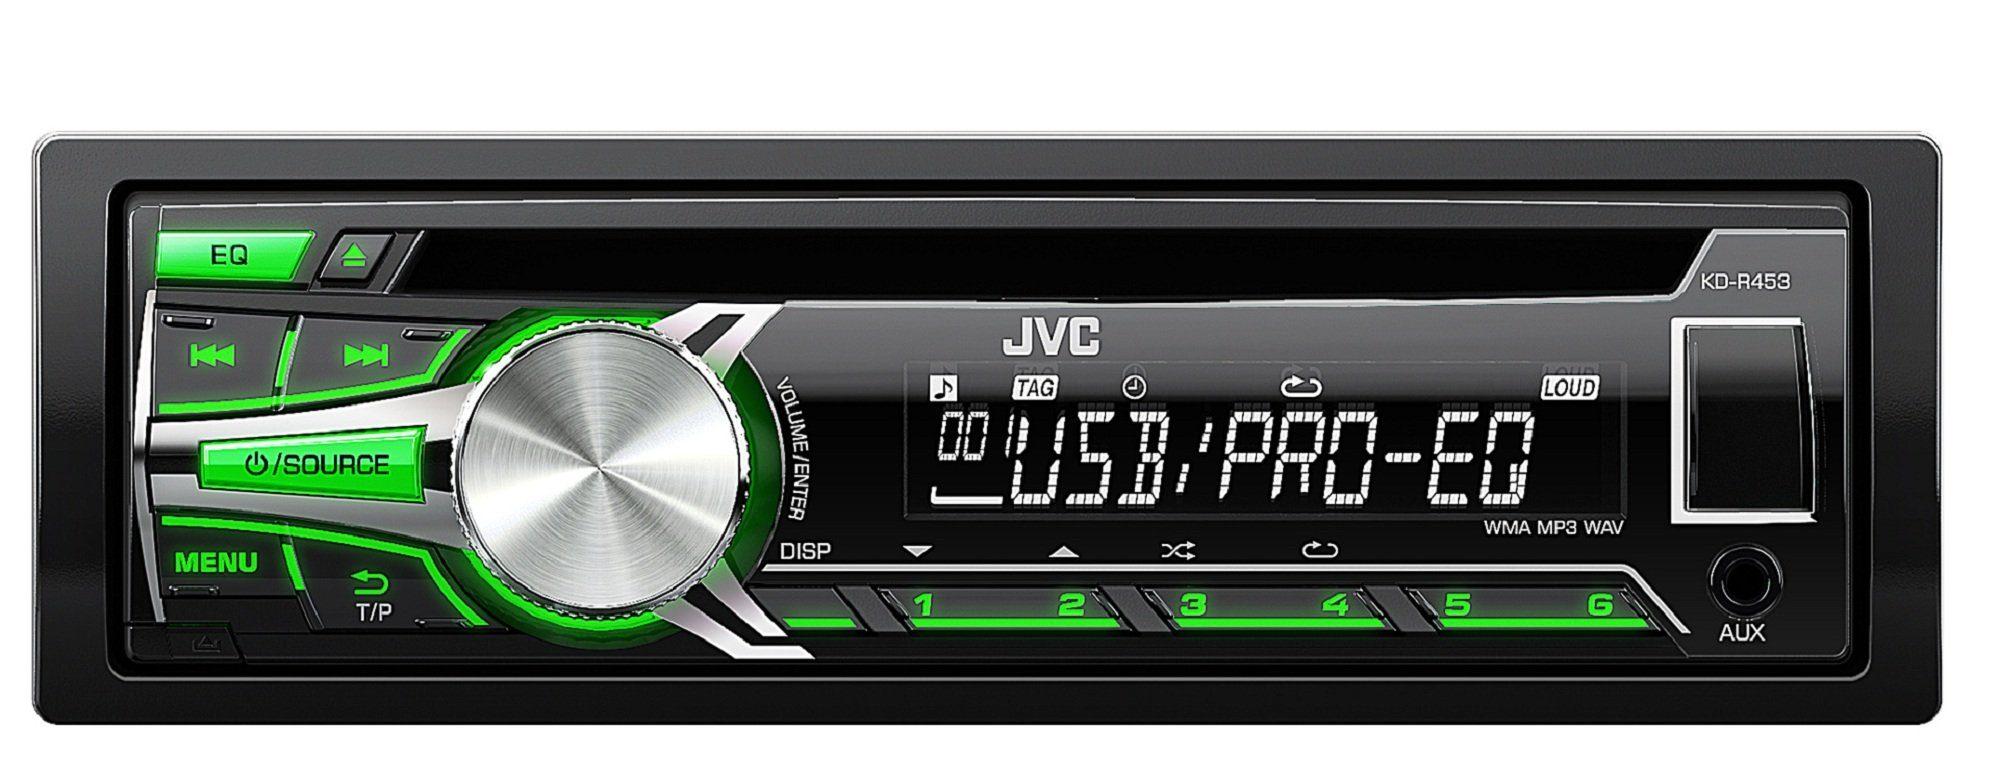 JVC 1-DIN Autoradio USB/CD-Receiver »KD-R453E«